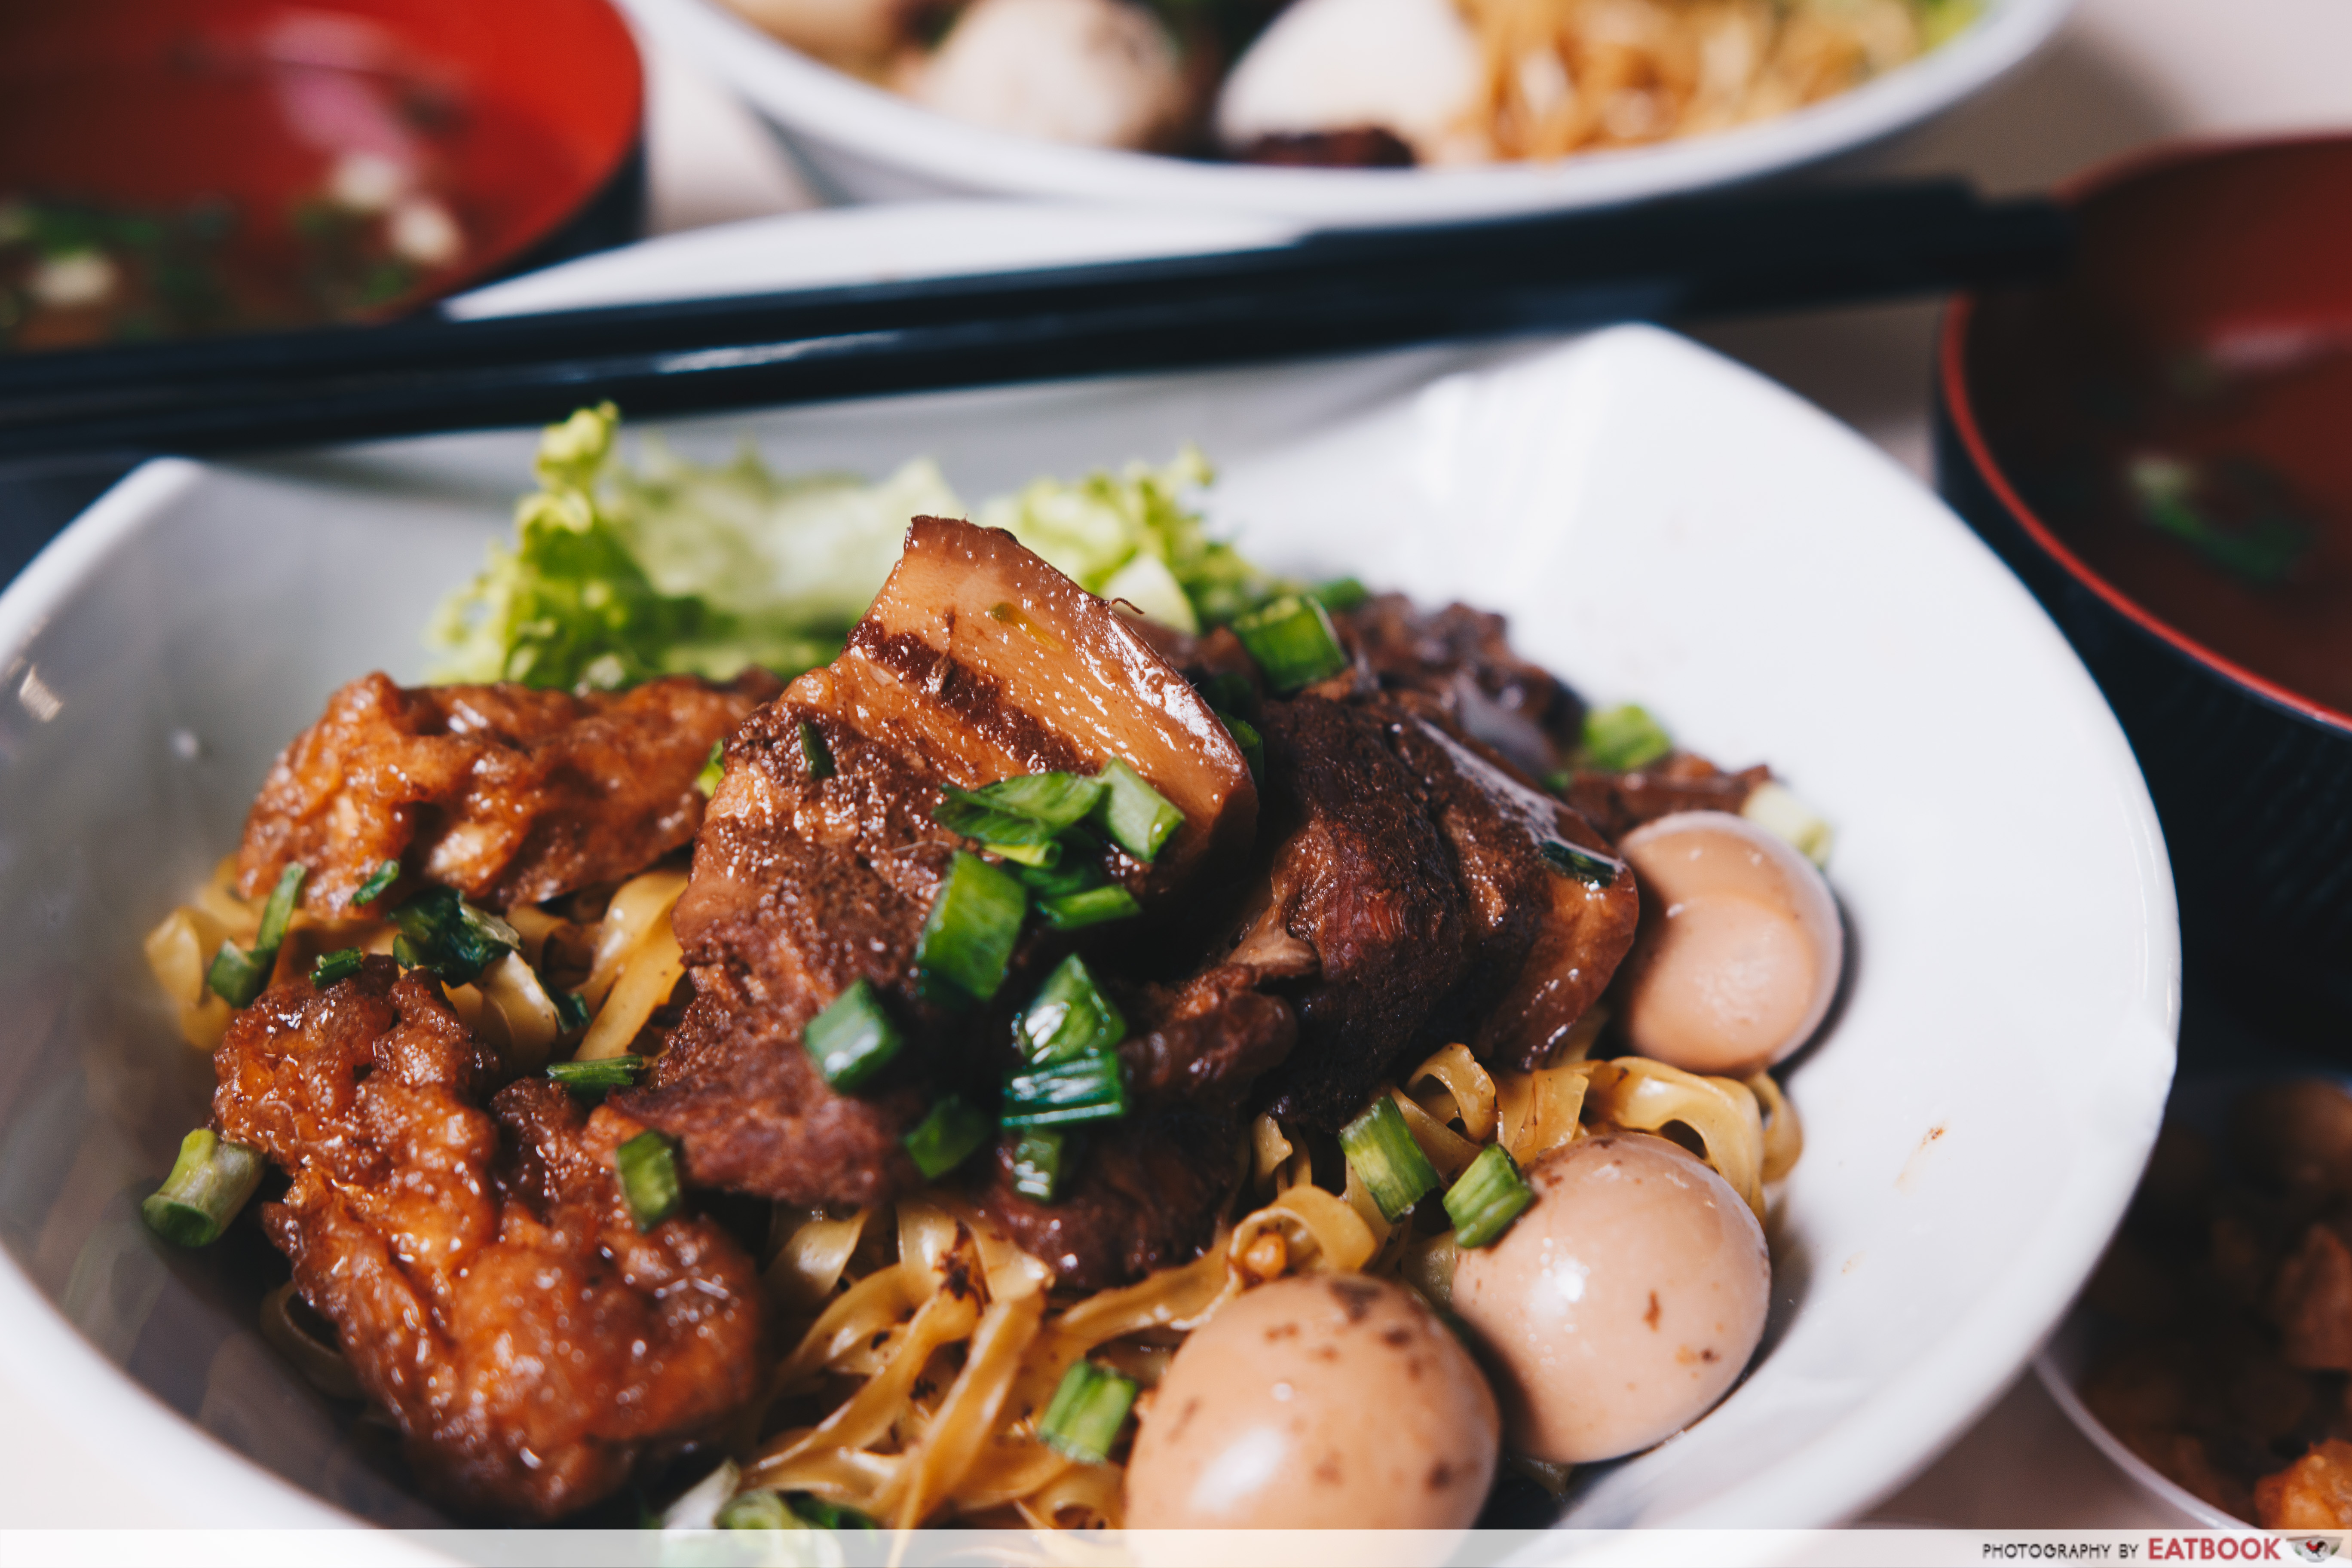 Aw's Signature Minced Pork Noodles - Braised Pork Noodle